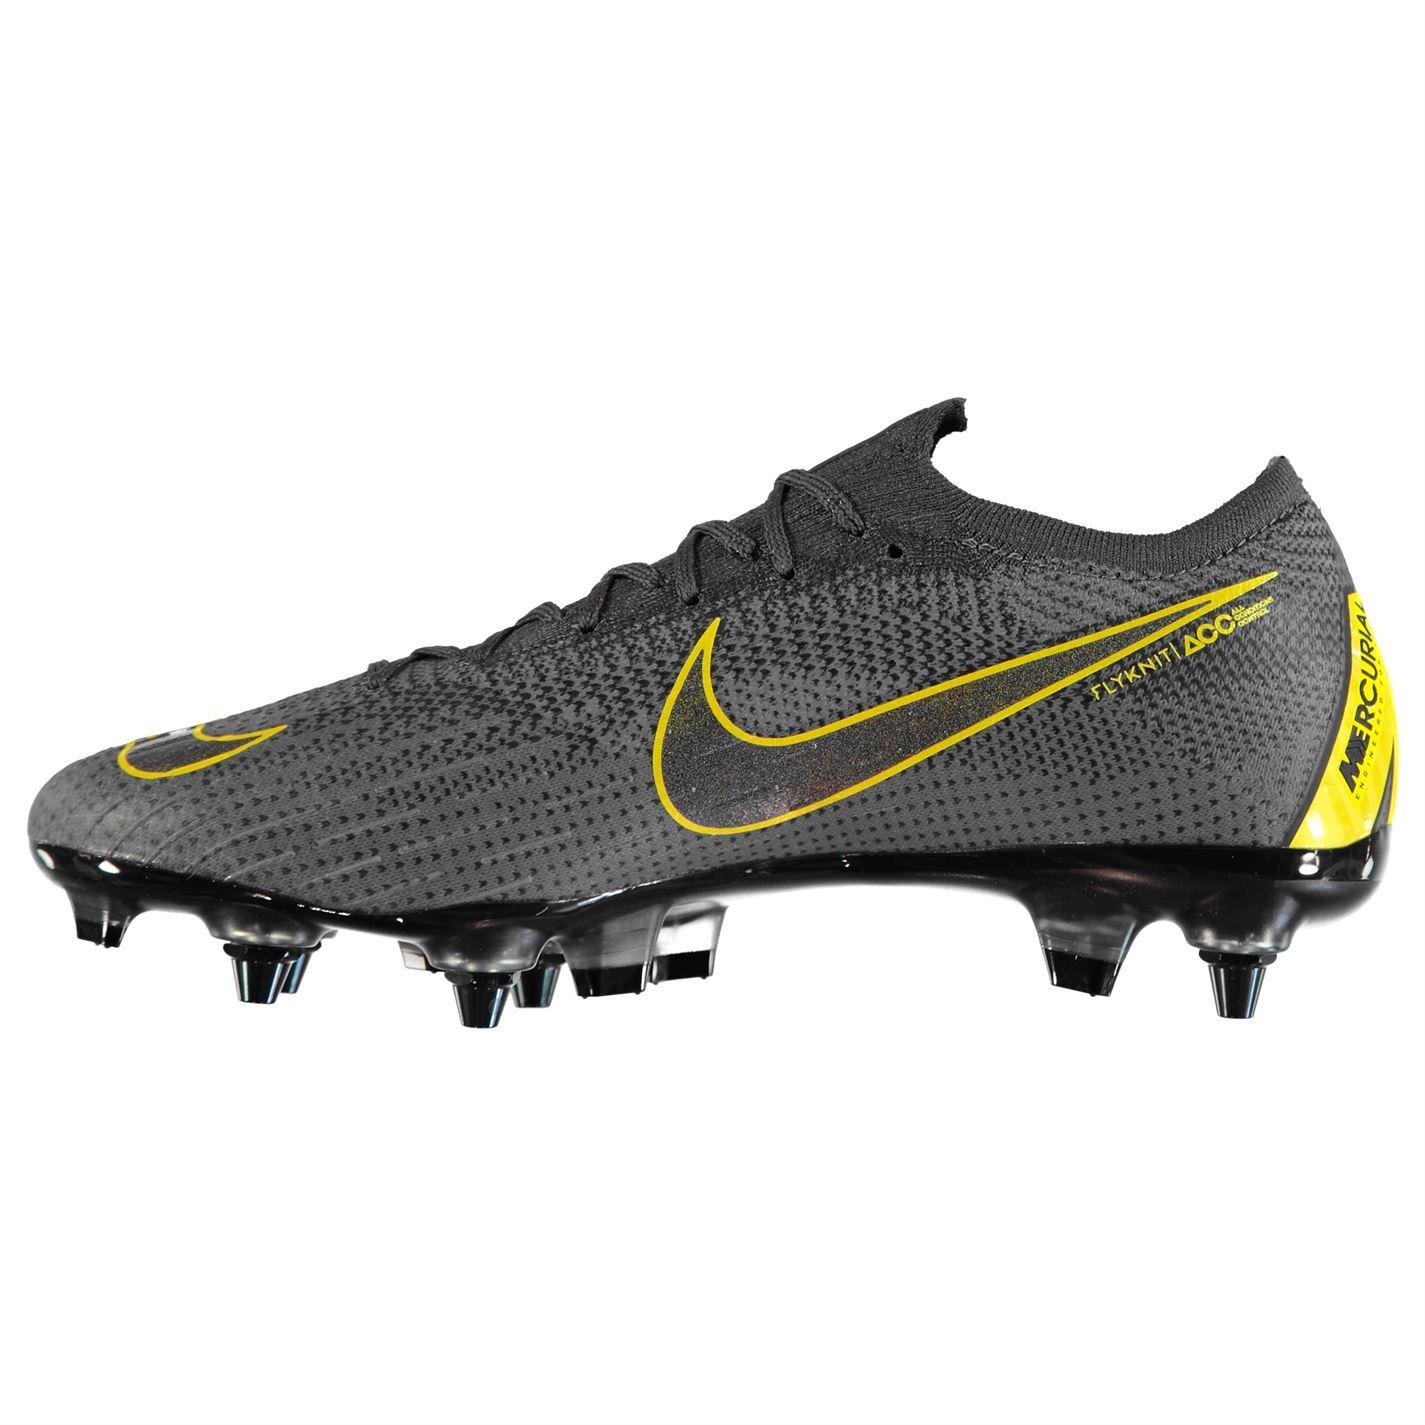 Nike Mercurial Vapor Elite Mens SG Football Boots